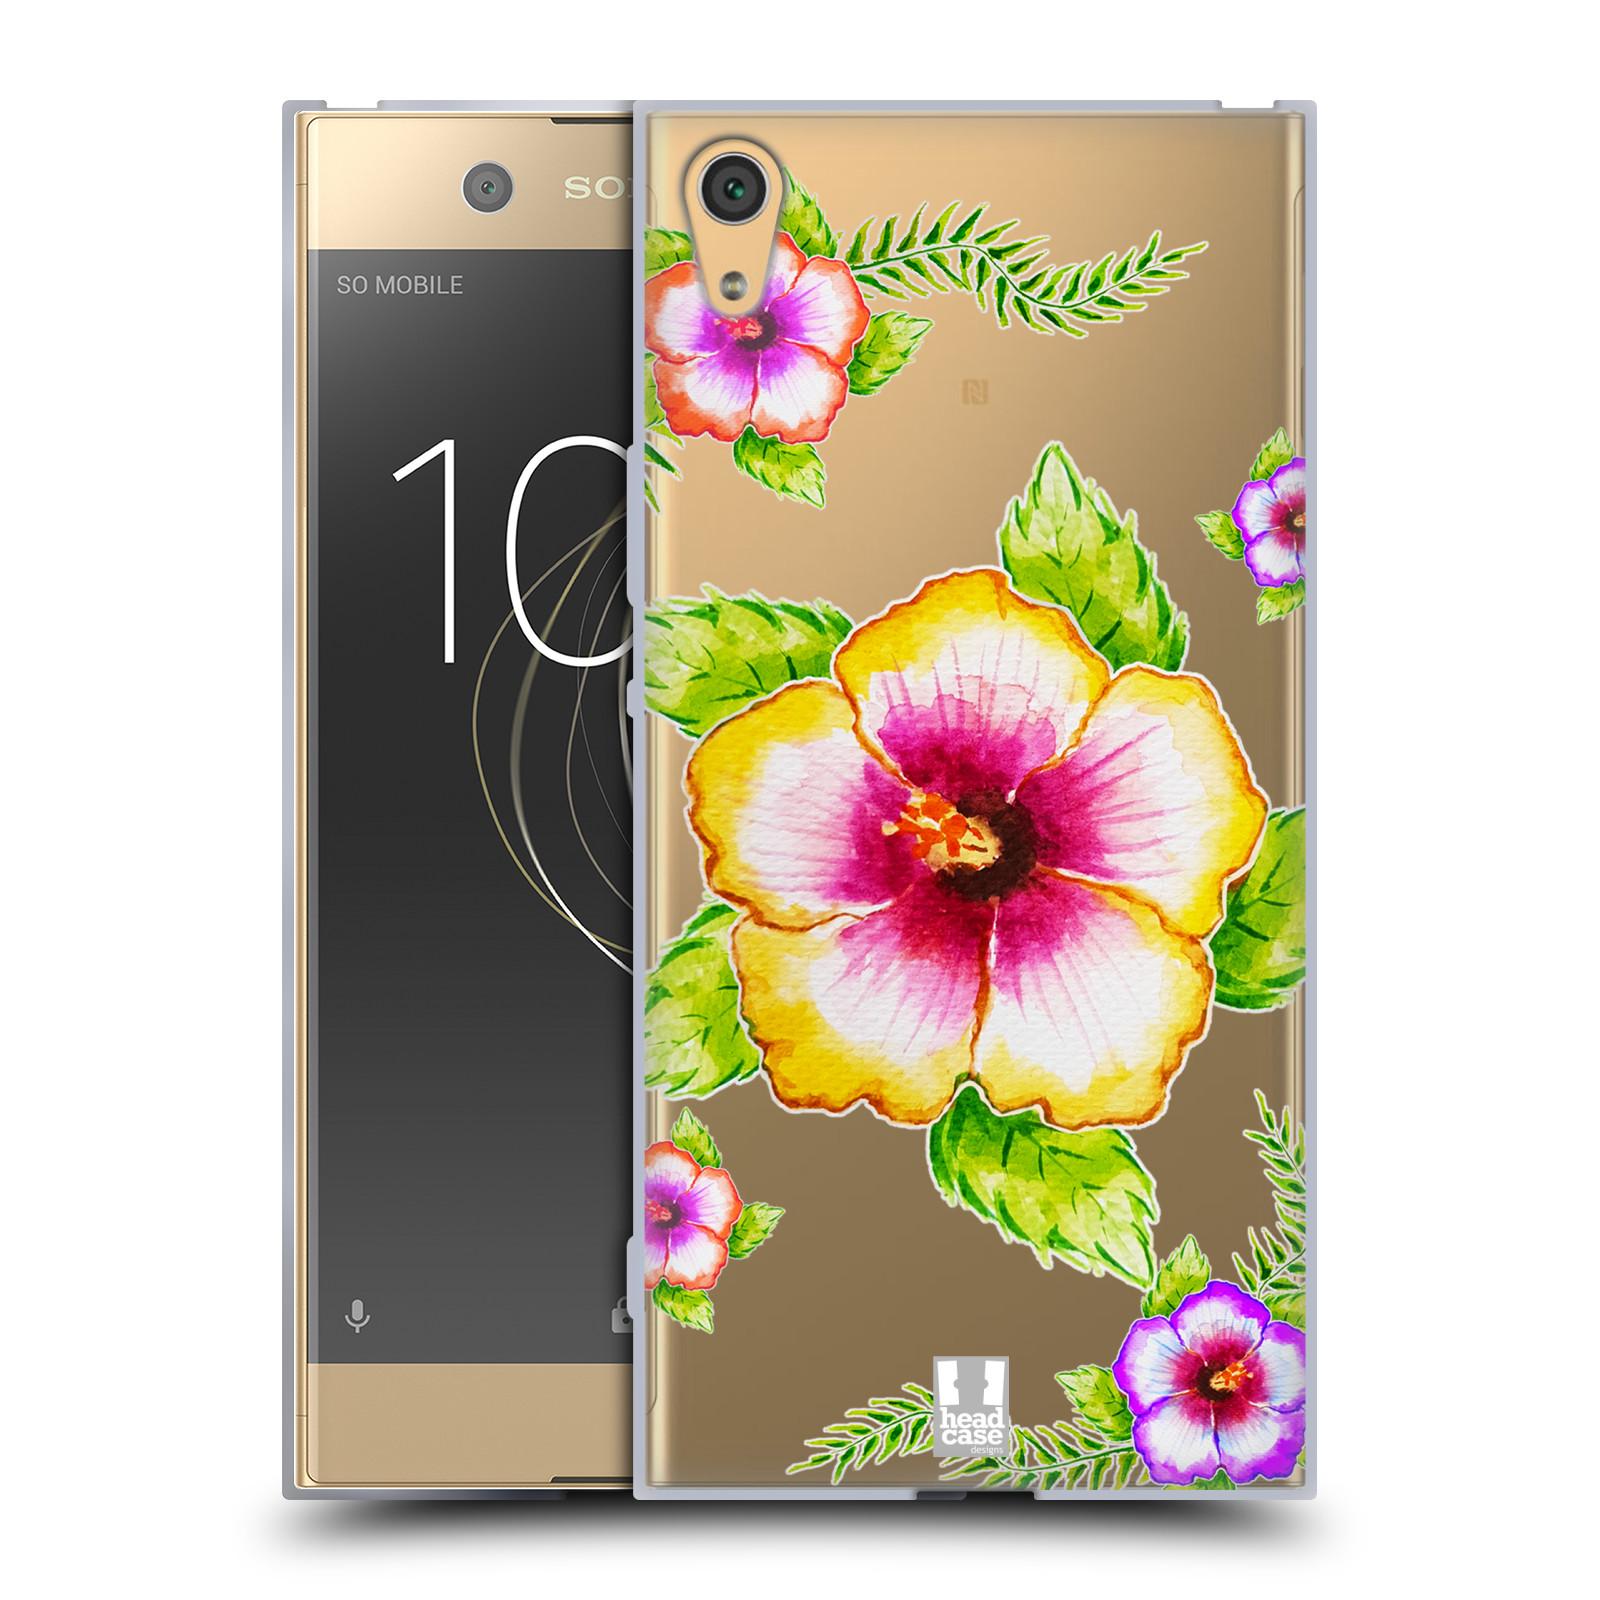 HEAD CASE silikonový obal na mobil Sony Xperia XA1 ULTRA Květina Ibišek vodní barvy